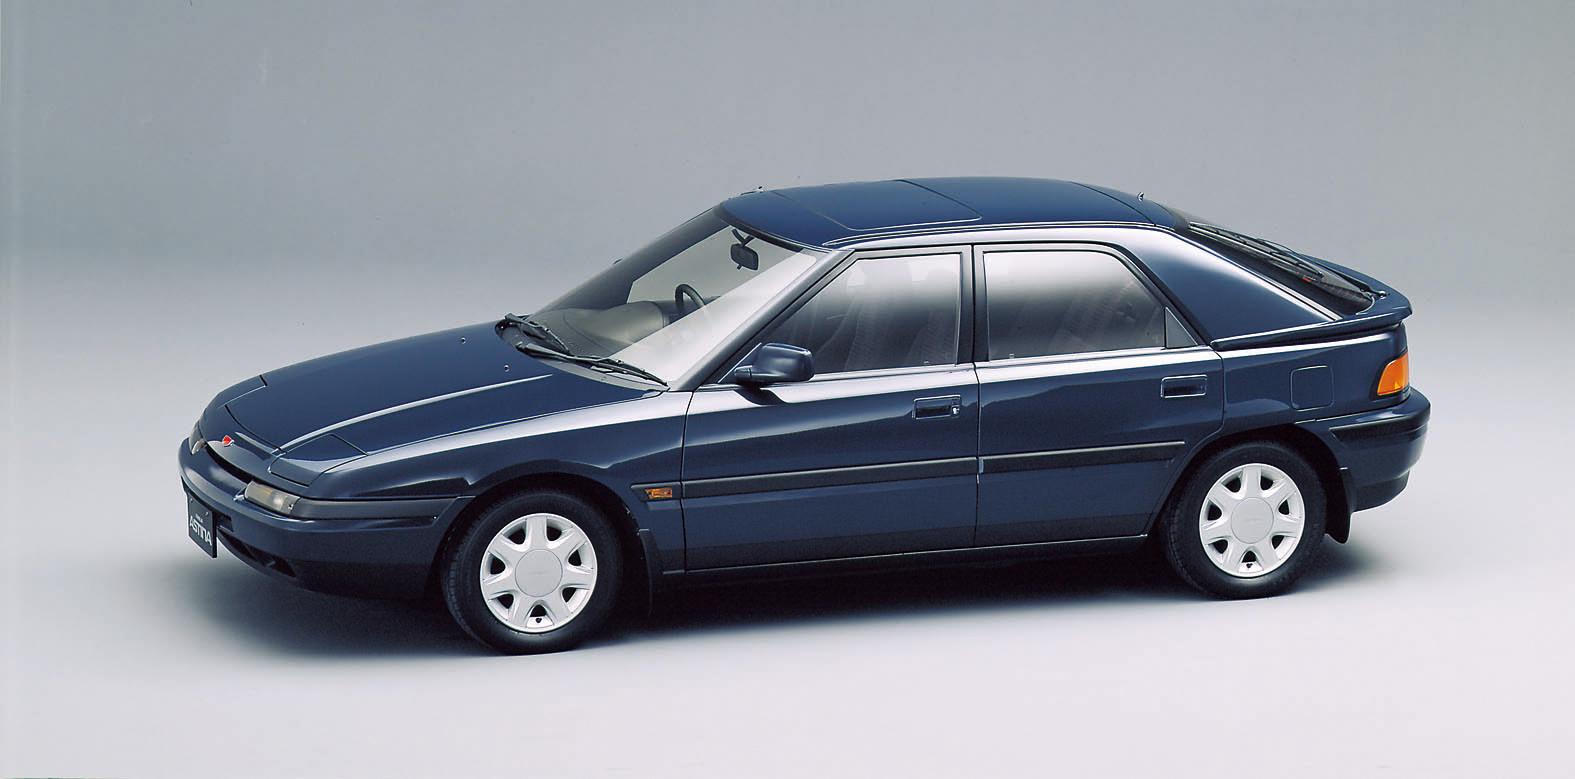 Mazda 323 Familia Astina 1989